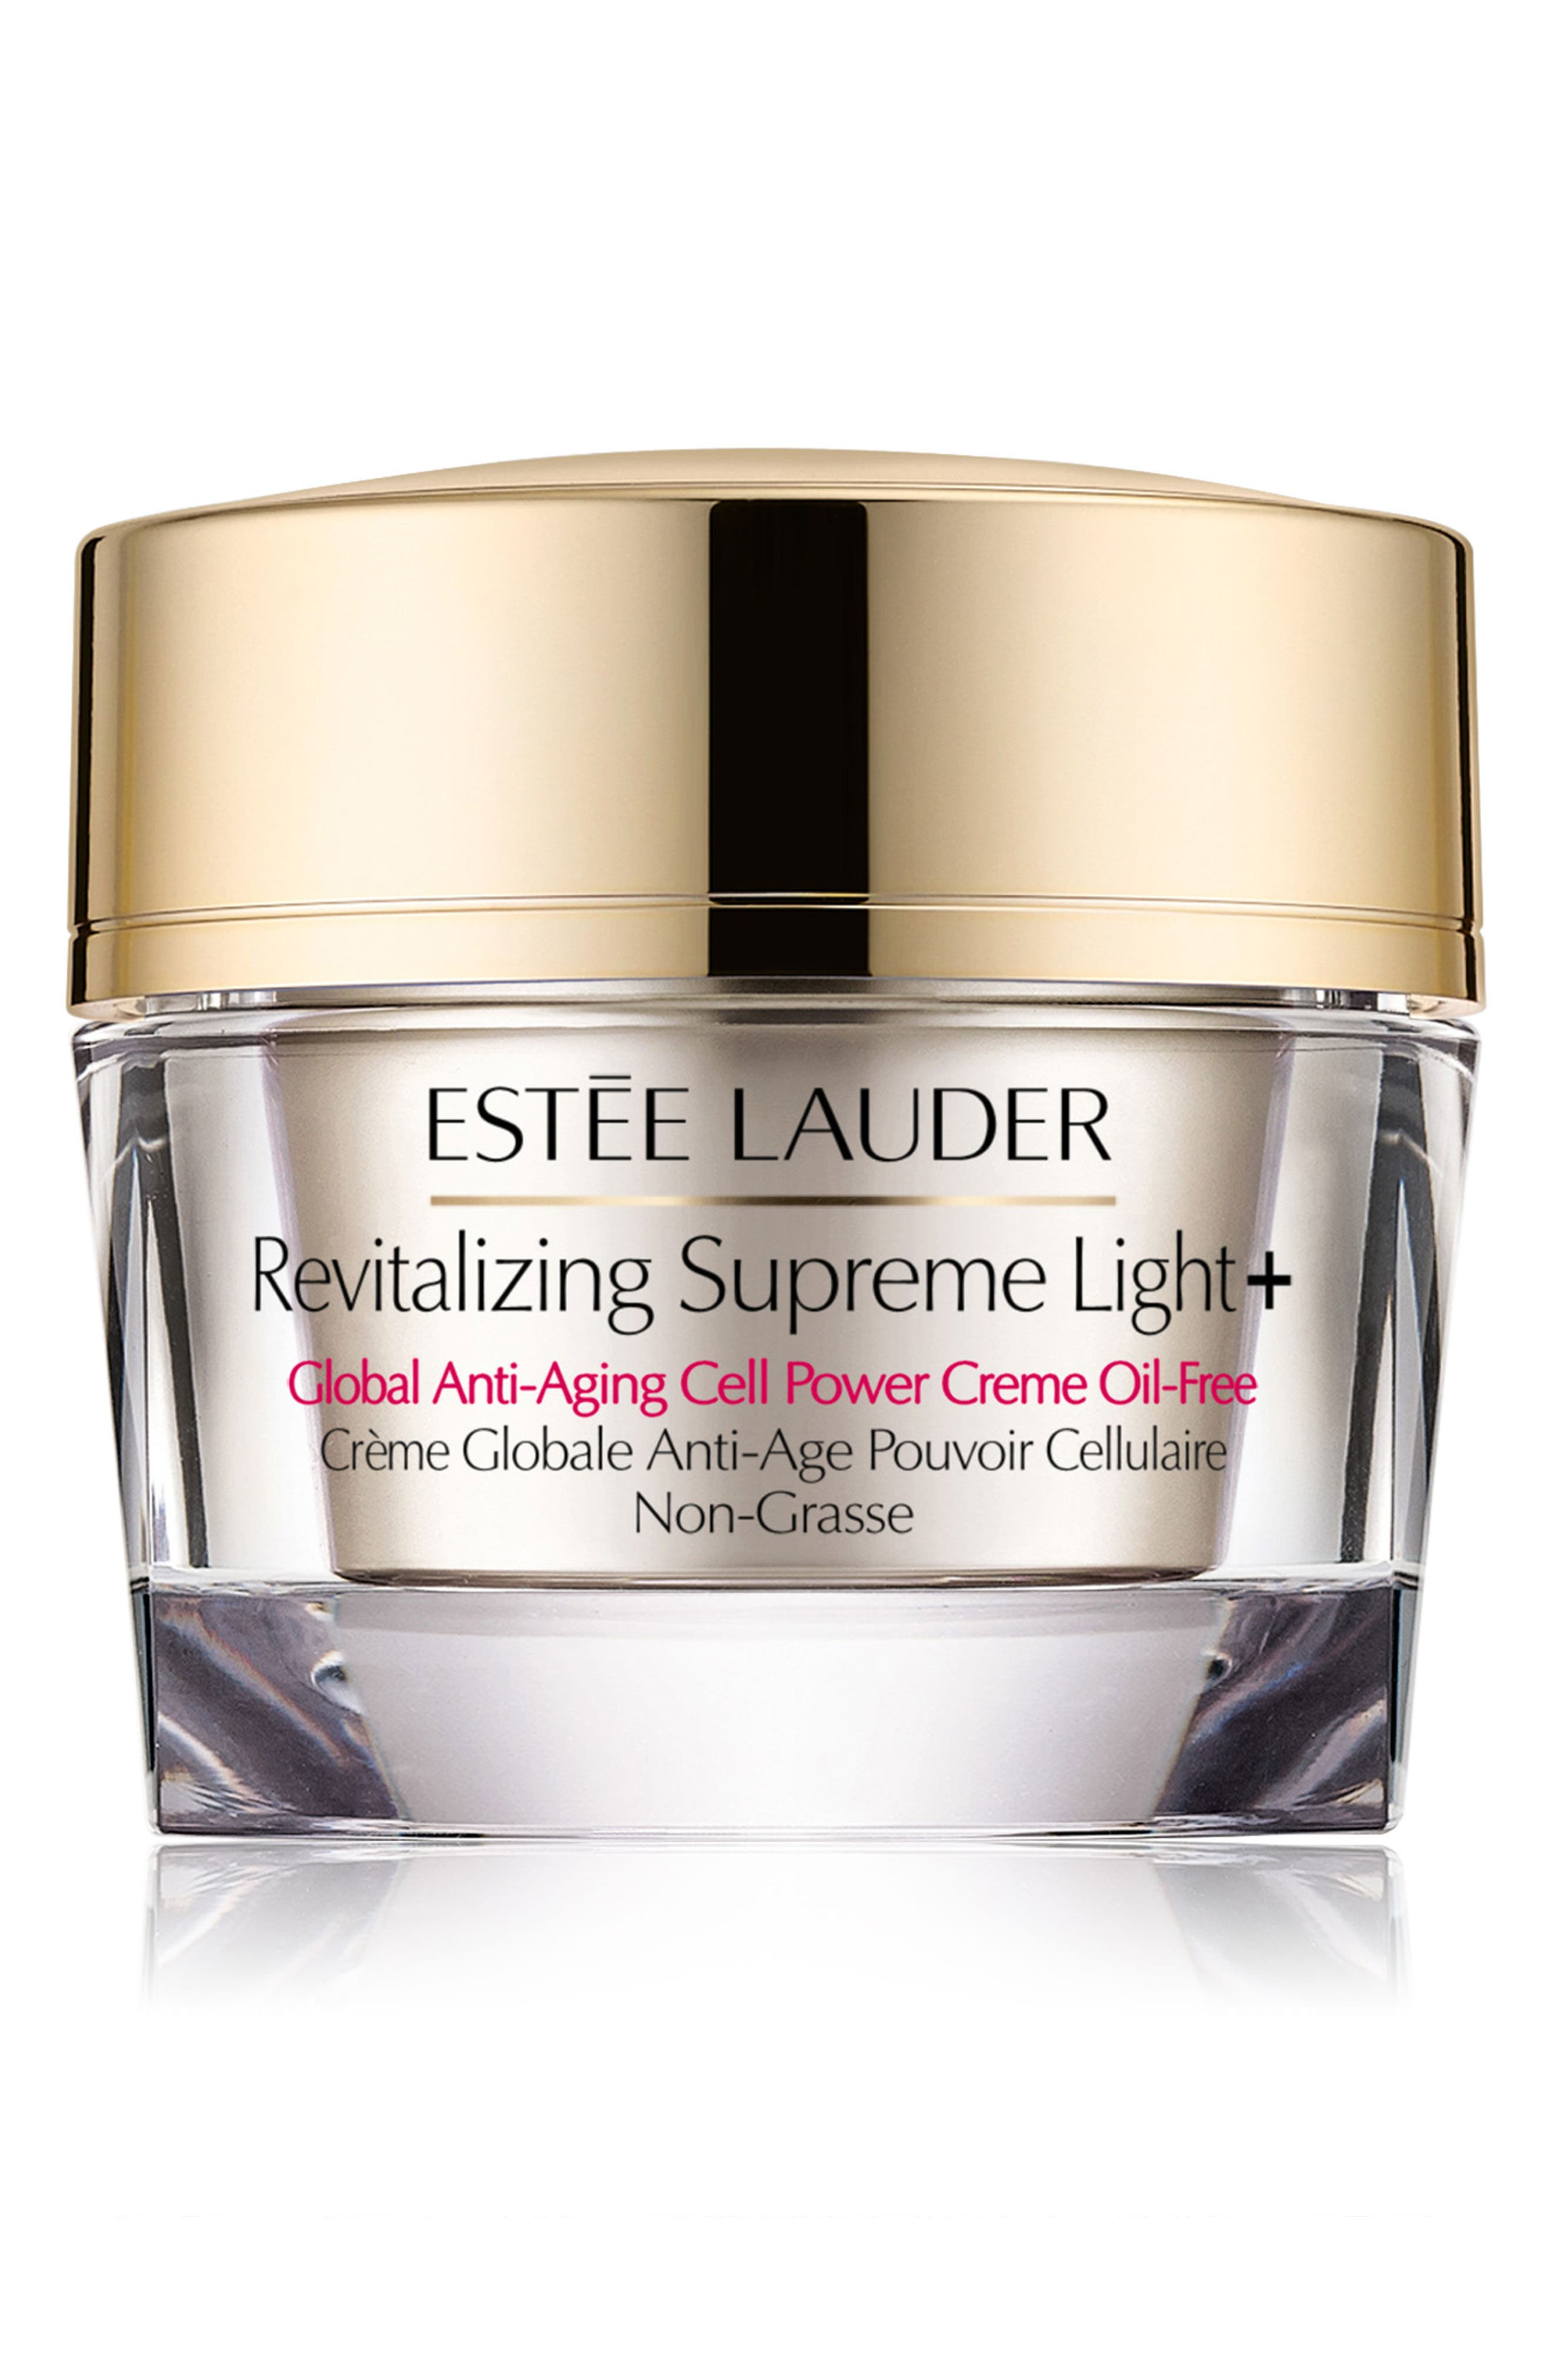 ESTÉE LAUDER, Revitalizing Supreme Light+ Global Anti-Aging Cell Power Creme Oil-Free, Main thumbnail 1, color, 960